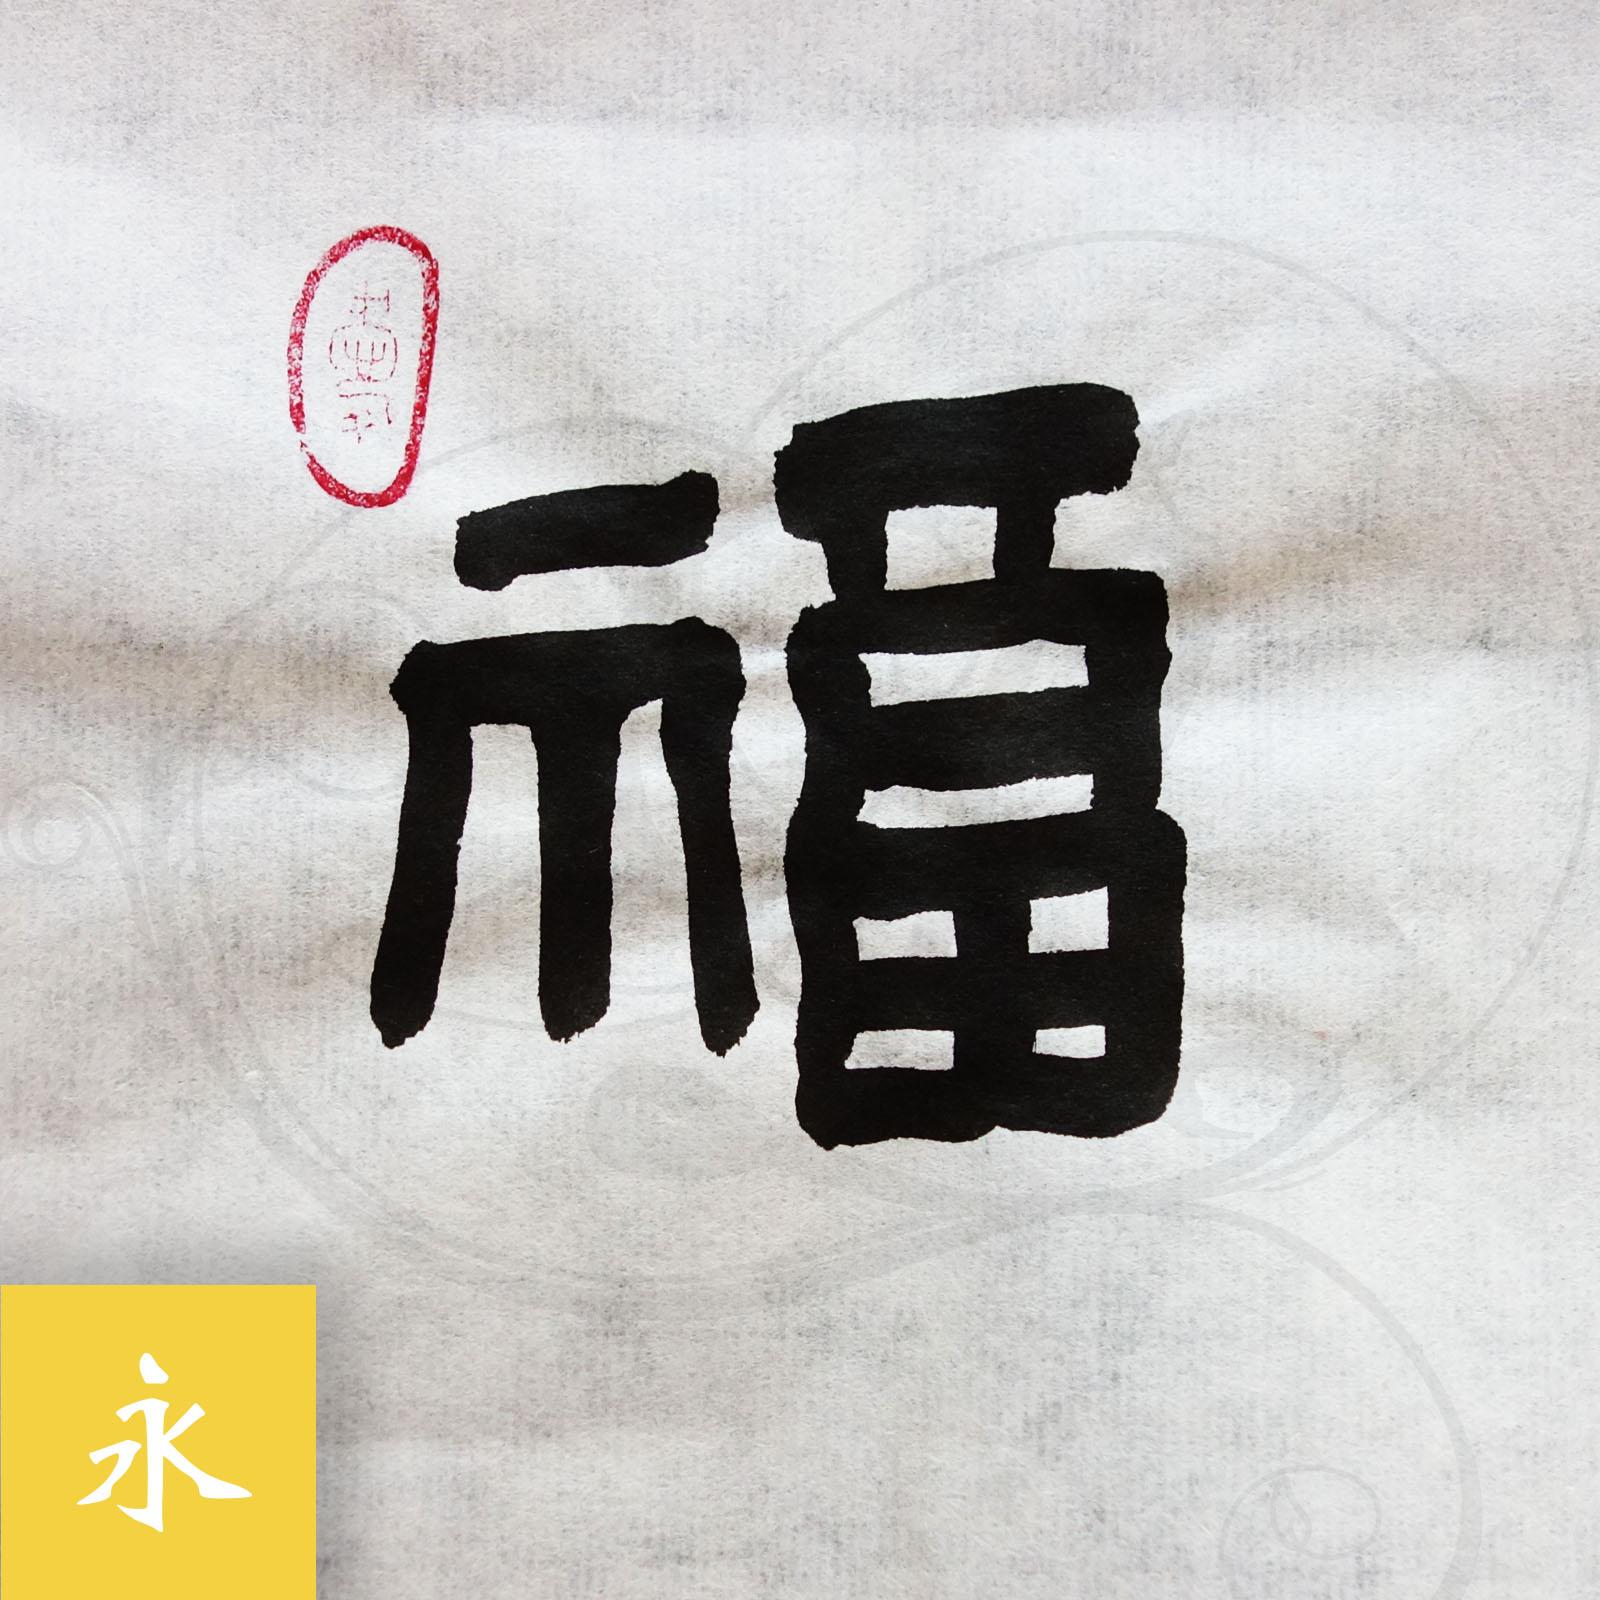 calligraphie-chinoise-vertus-li-shu-bonheur-01